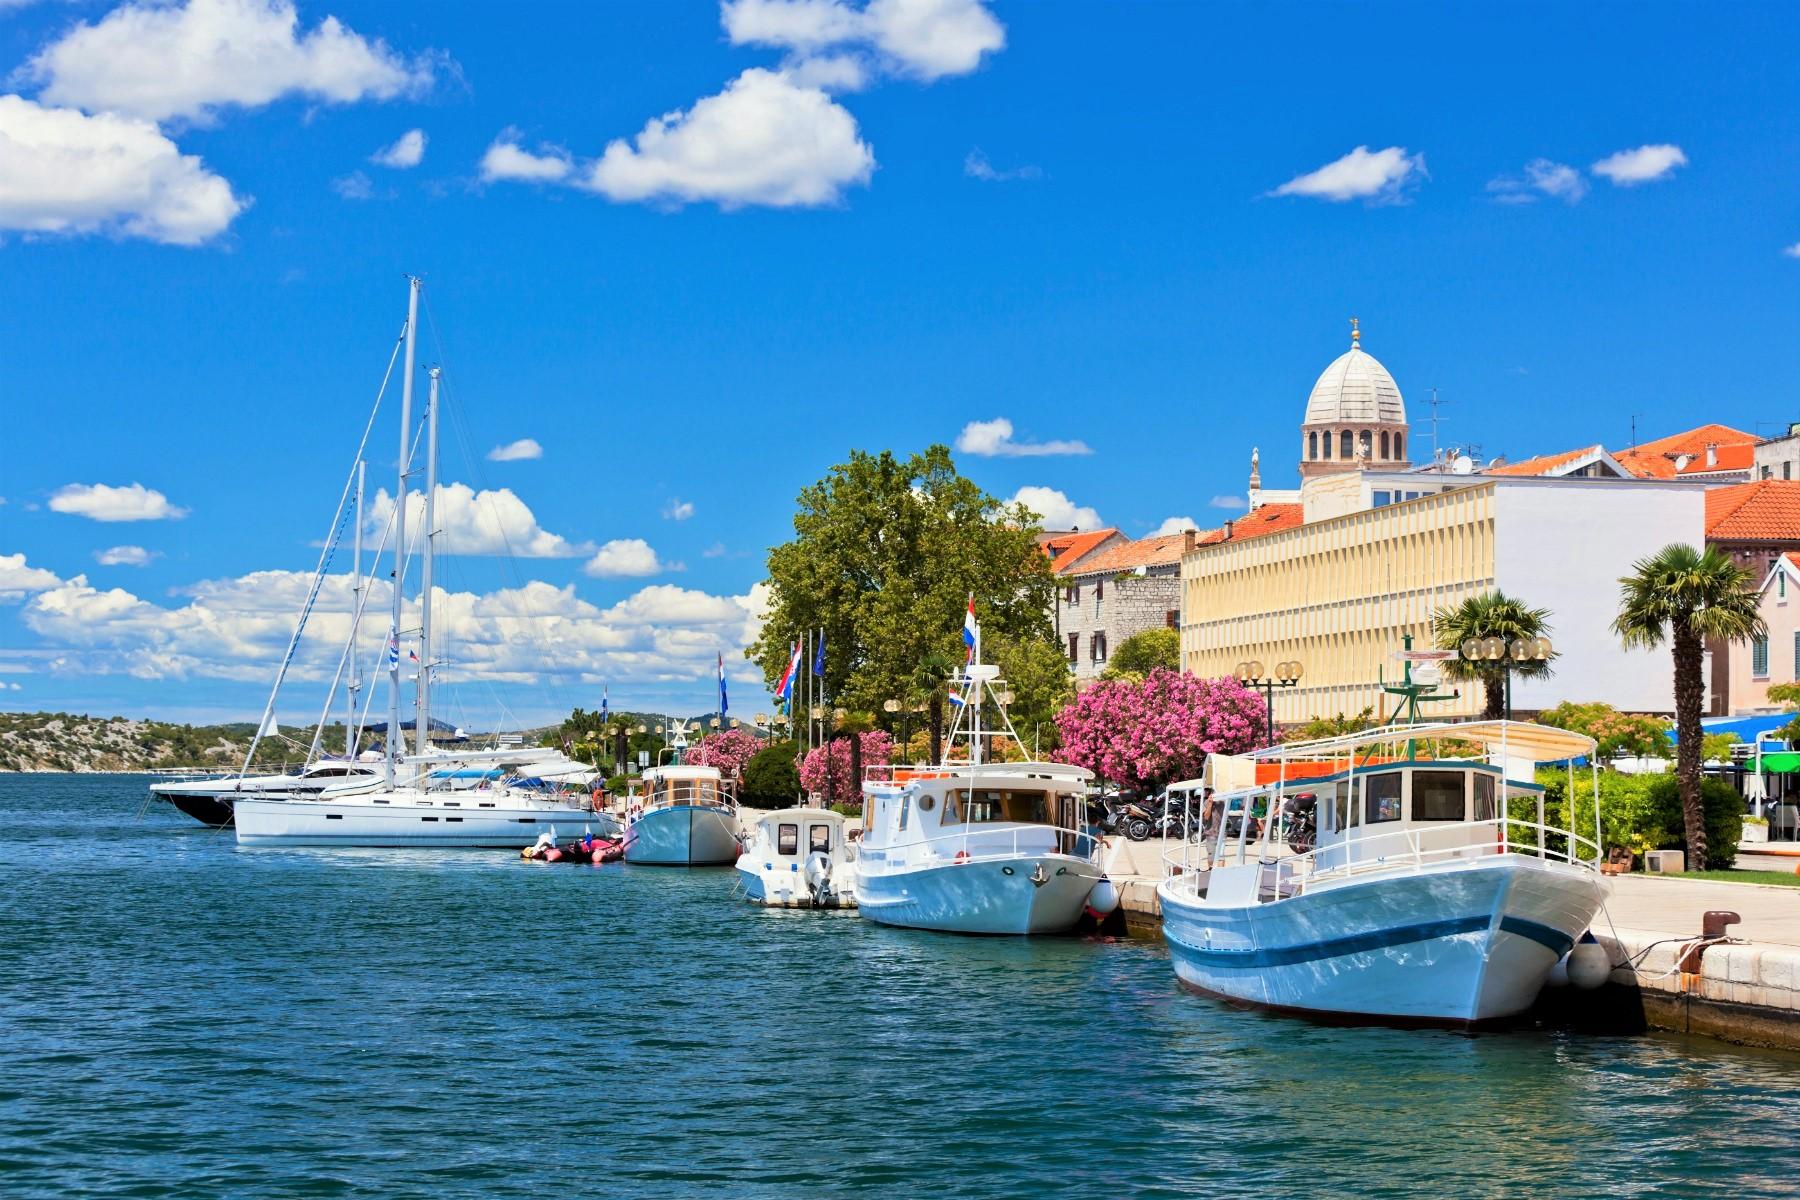 Shibenik Отдых в Хорватии туры хорватию хорватия Отдых в Хорватии — 9 курортных мест Адриатического побережья SHibenik